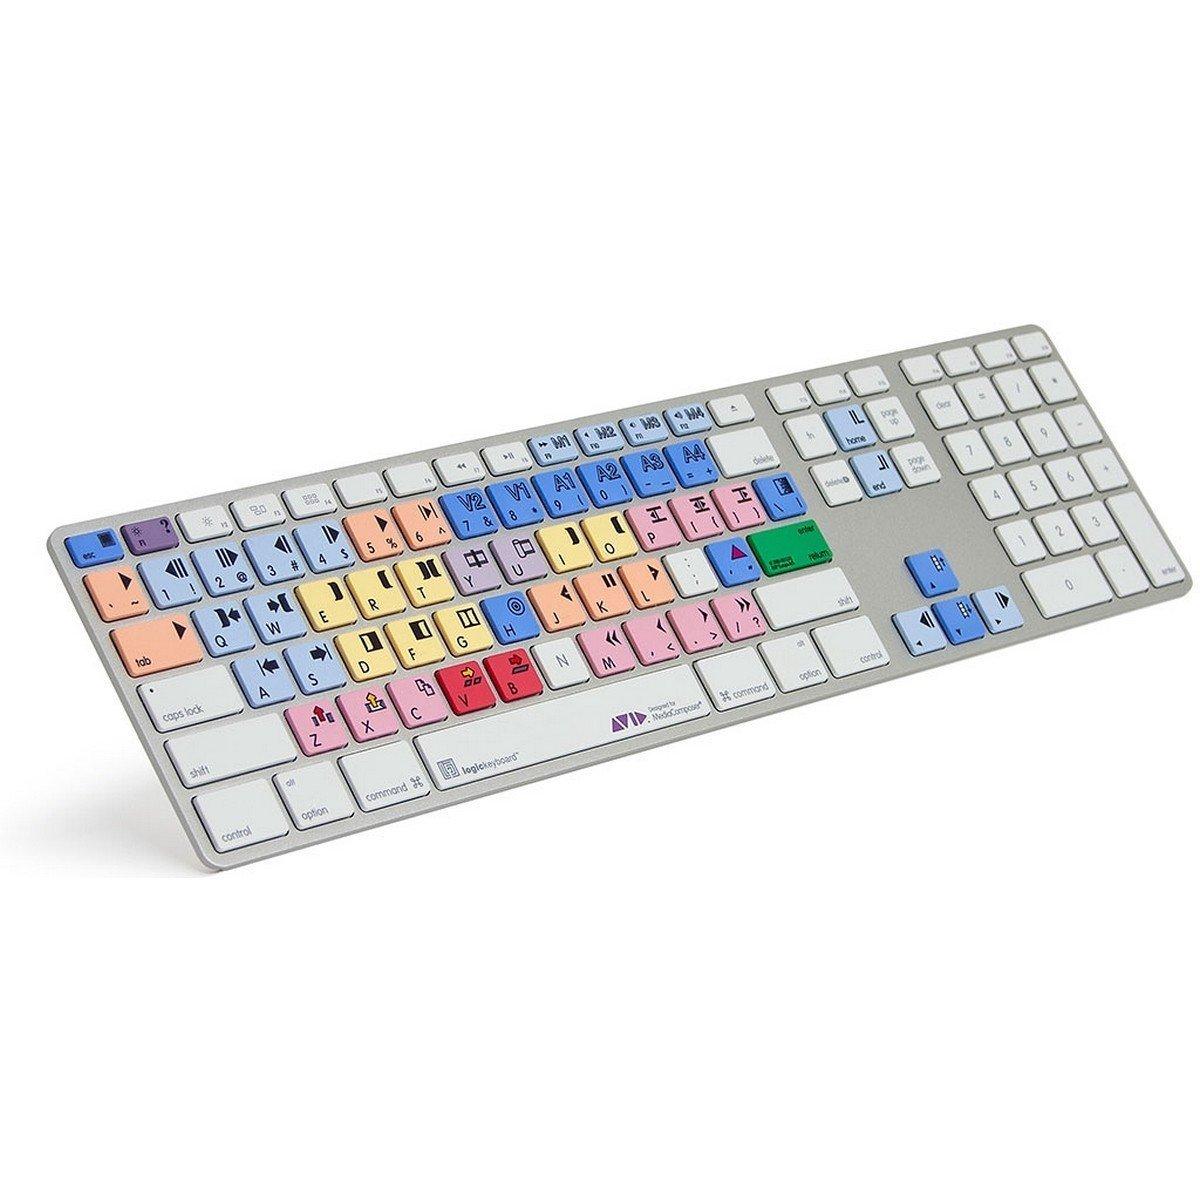 Logickeyboard Avid Media Composer Apple Pro Alu Keyboard | Ultra Thin Shortcut Keyboard for Avid Media Composer by Logickeyboard